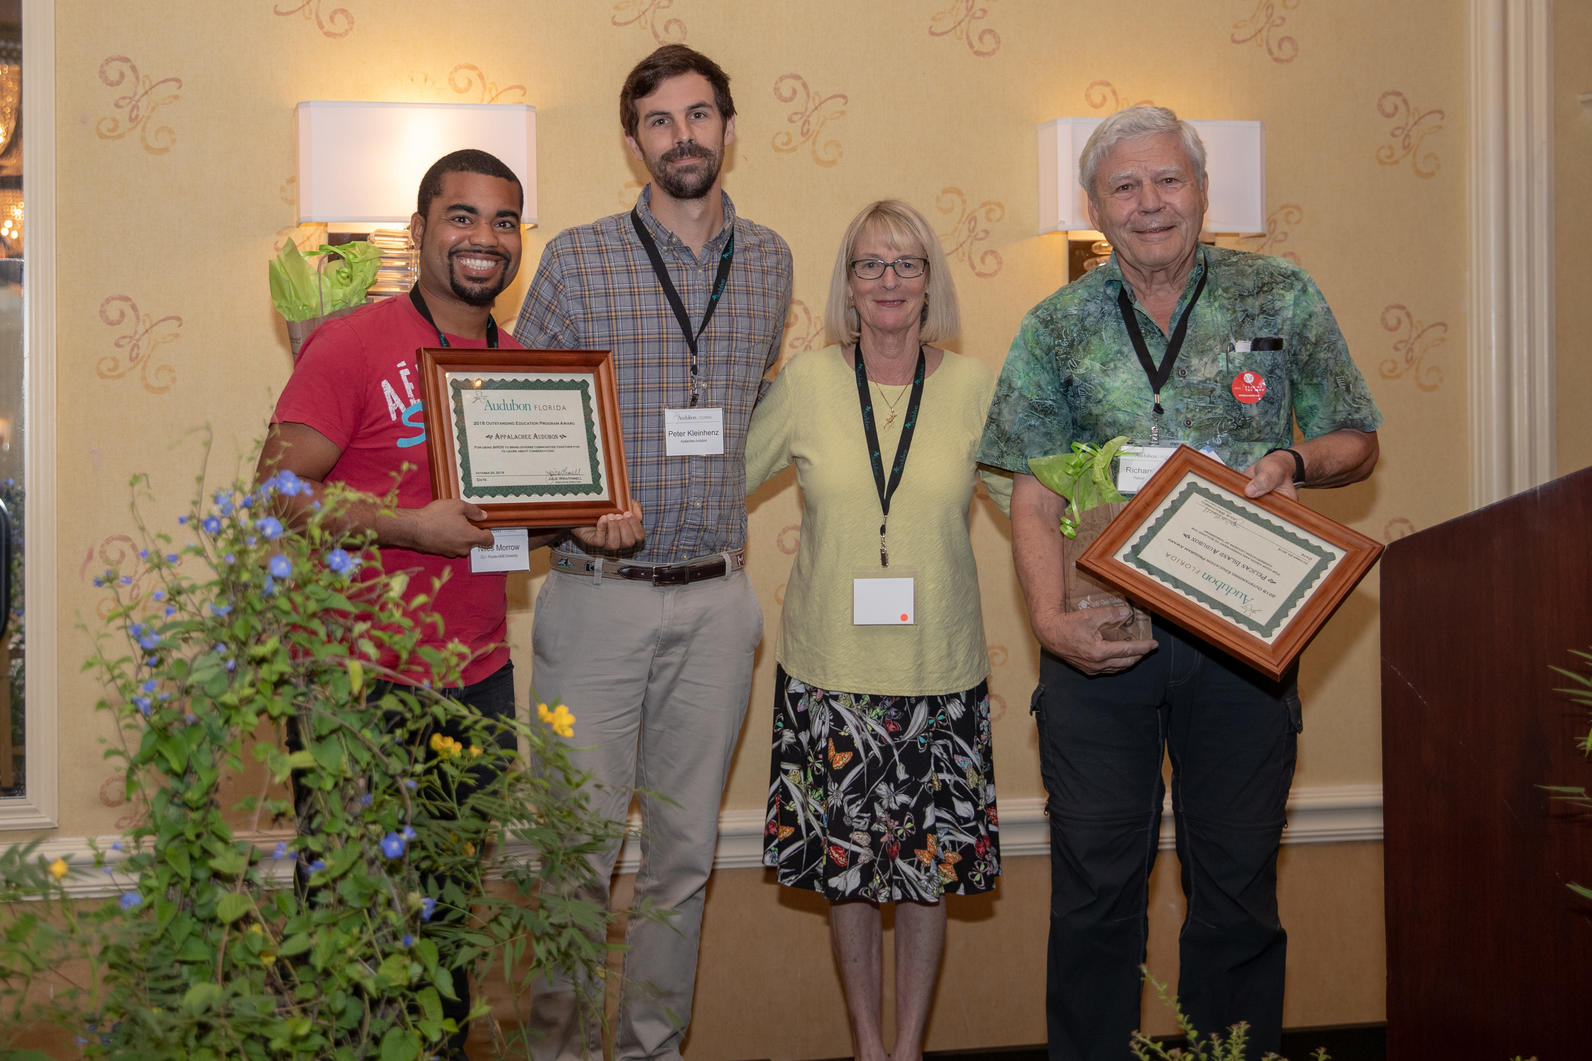 Audubon Chapter accepts Best Education Project Award